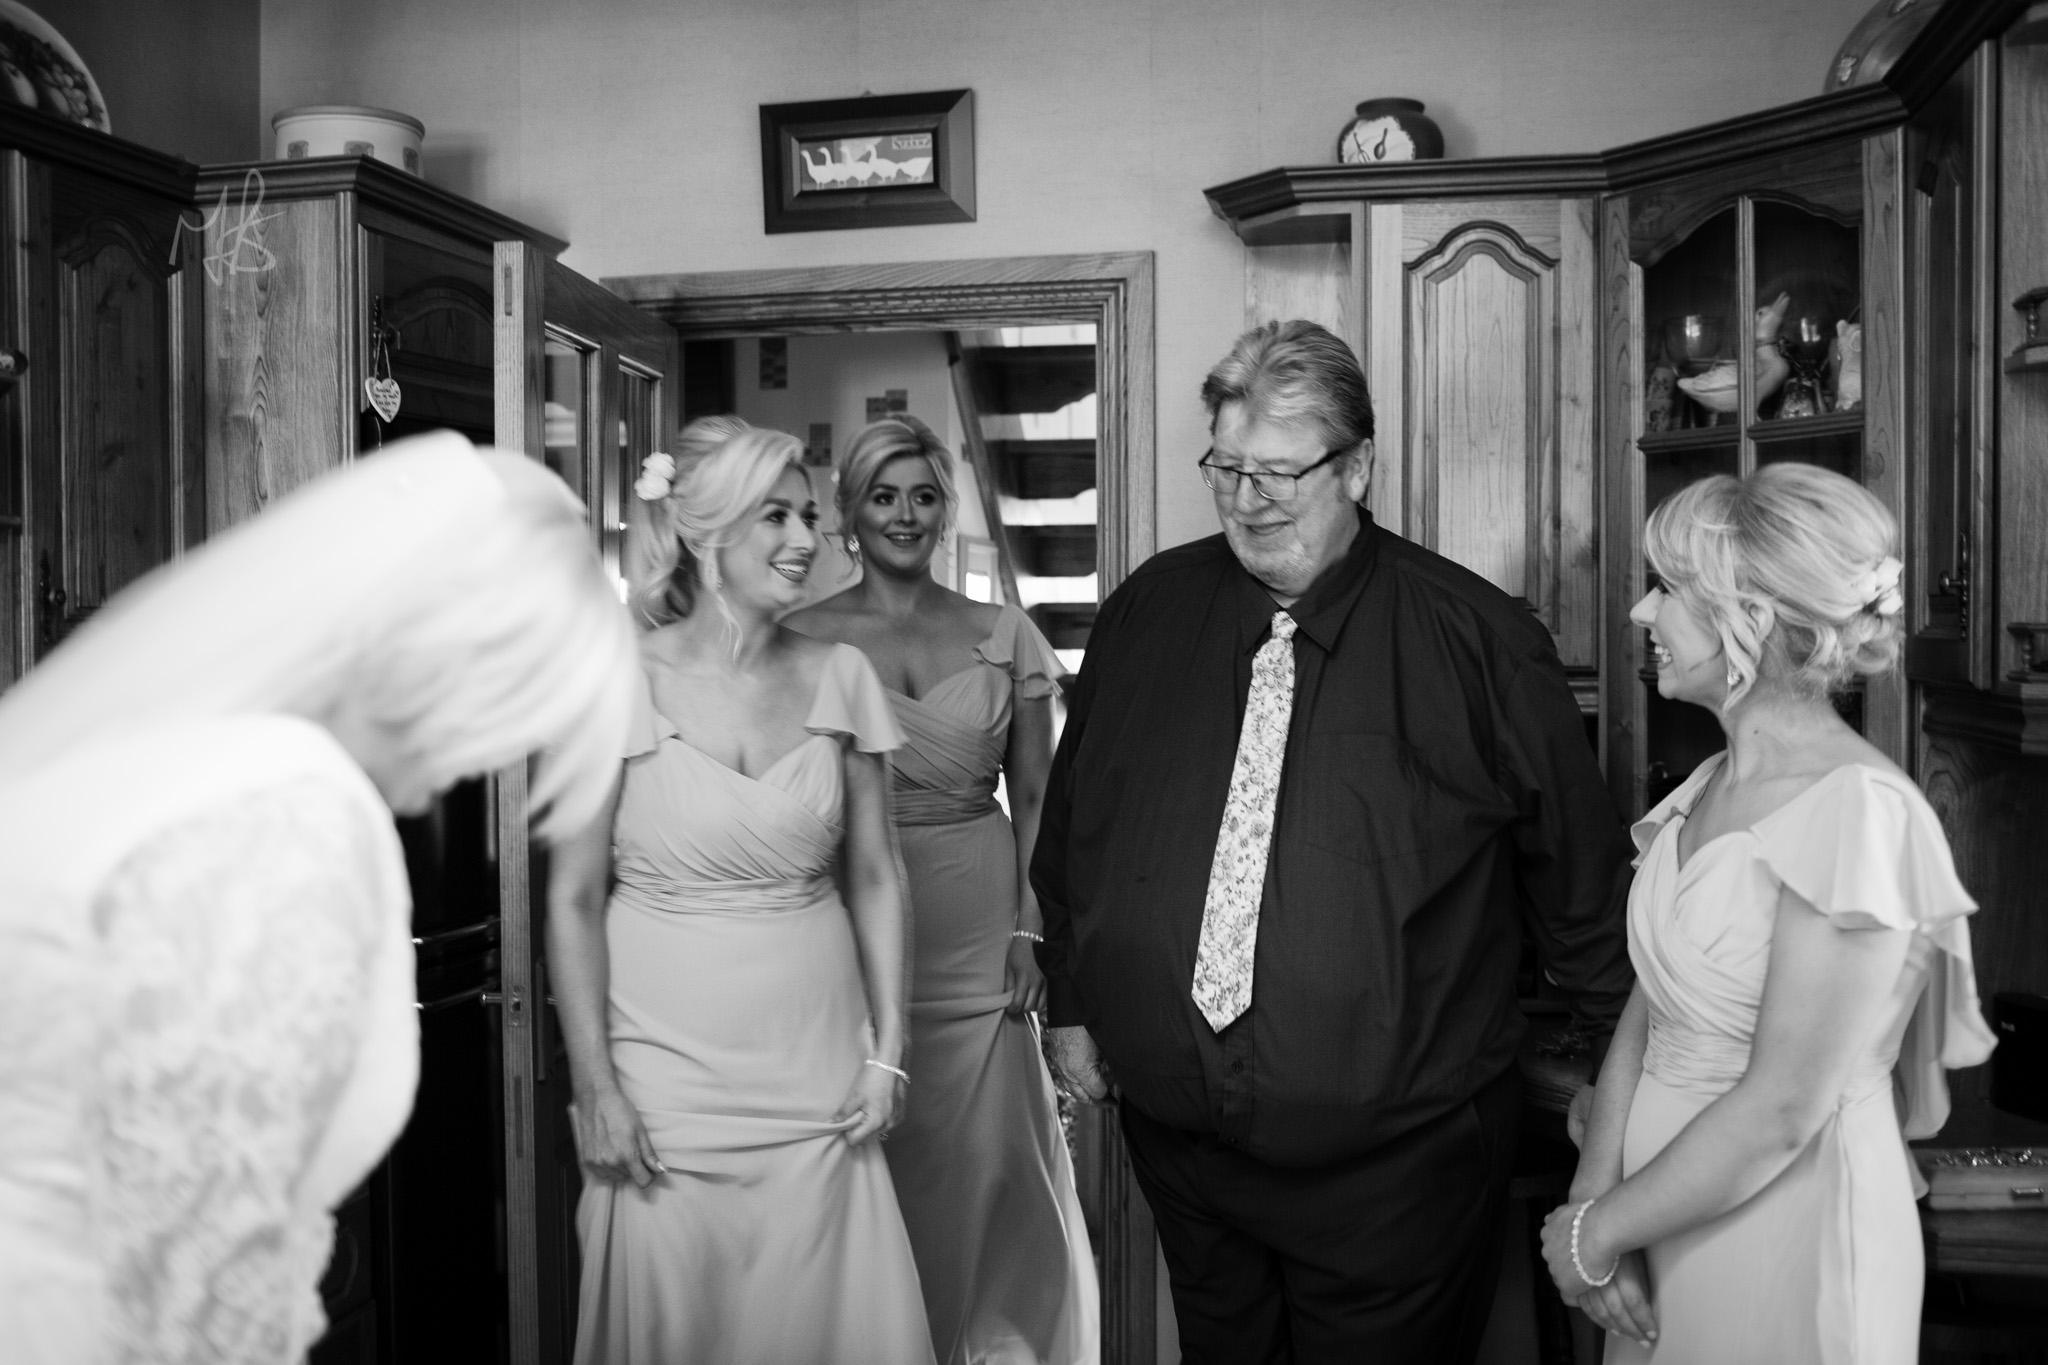 Northern-Ireland-Wedding-Photographer-Mark-Barnes-Ballymena_wedding-photography-Leighinmohr-House-Seamas_Alanna_For-web-11.jpg